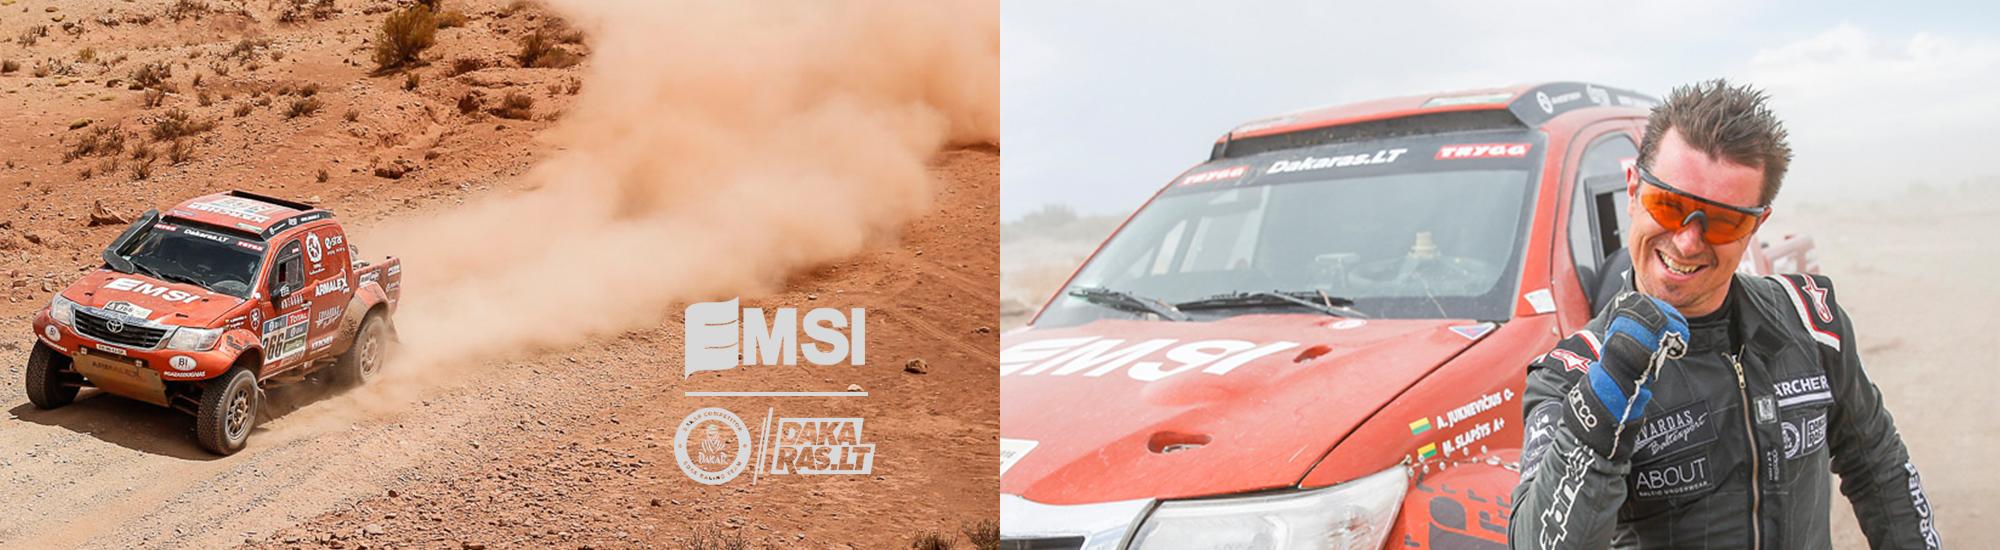 EMSI_baneris_Dakaras